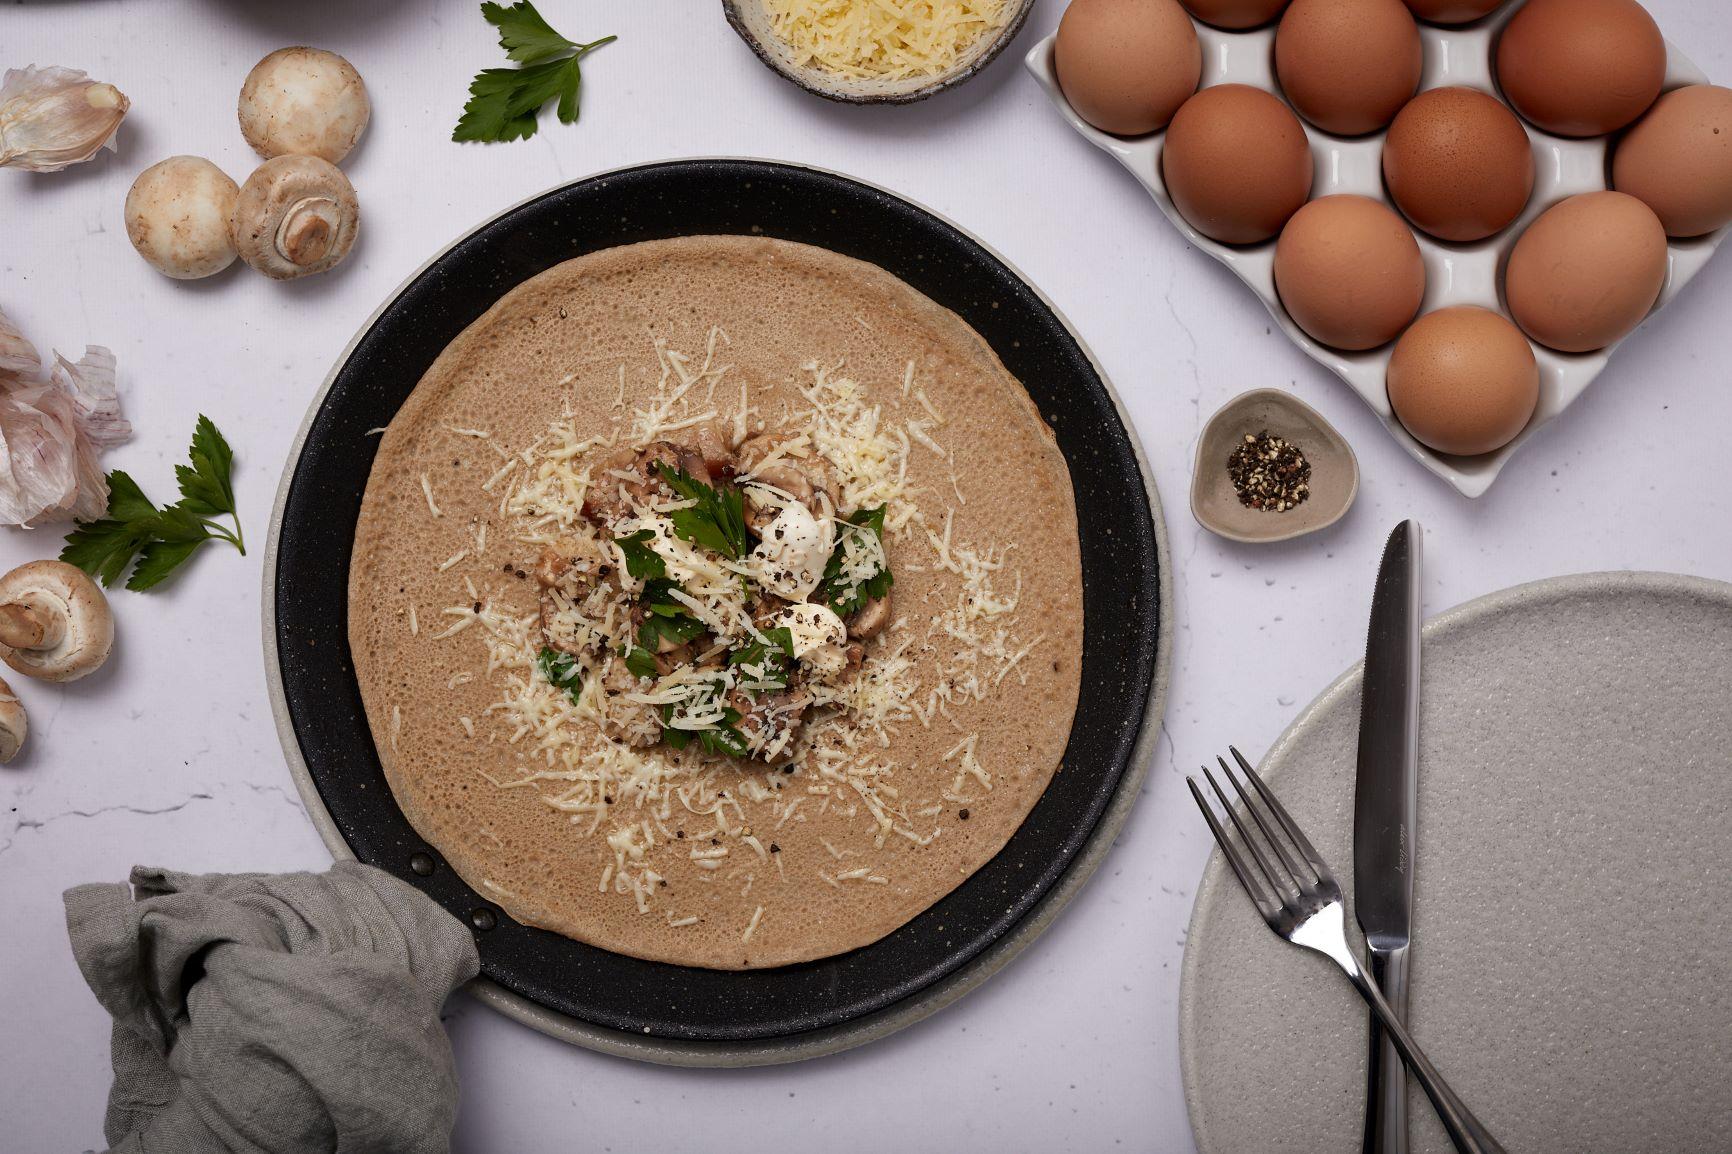 Manu S Savoury Buckwheat Crepes